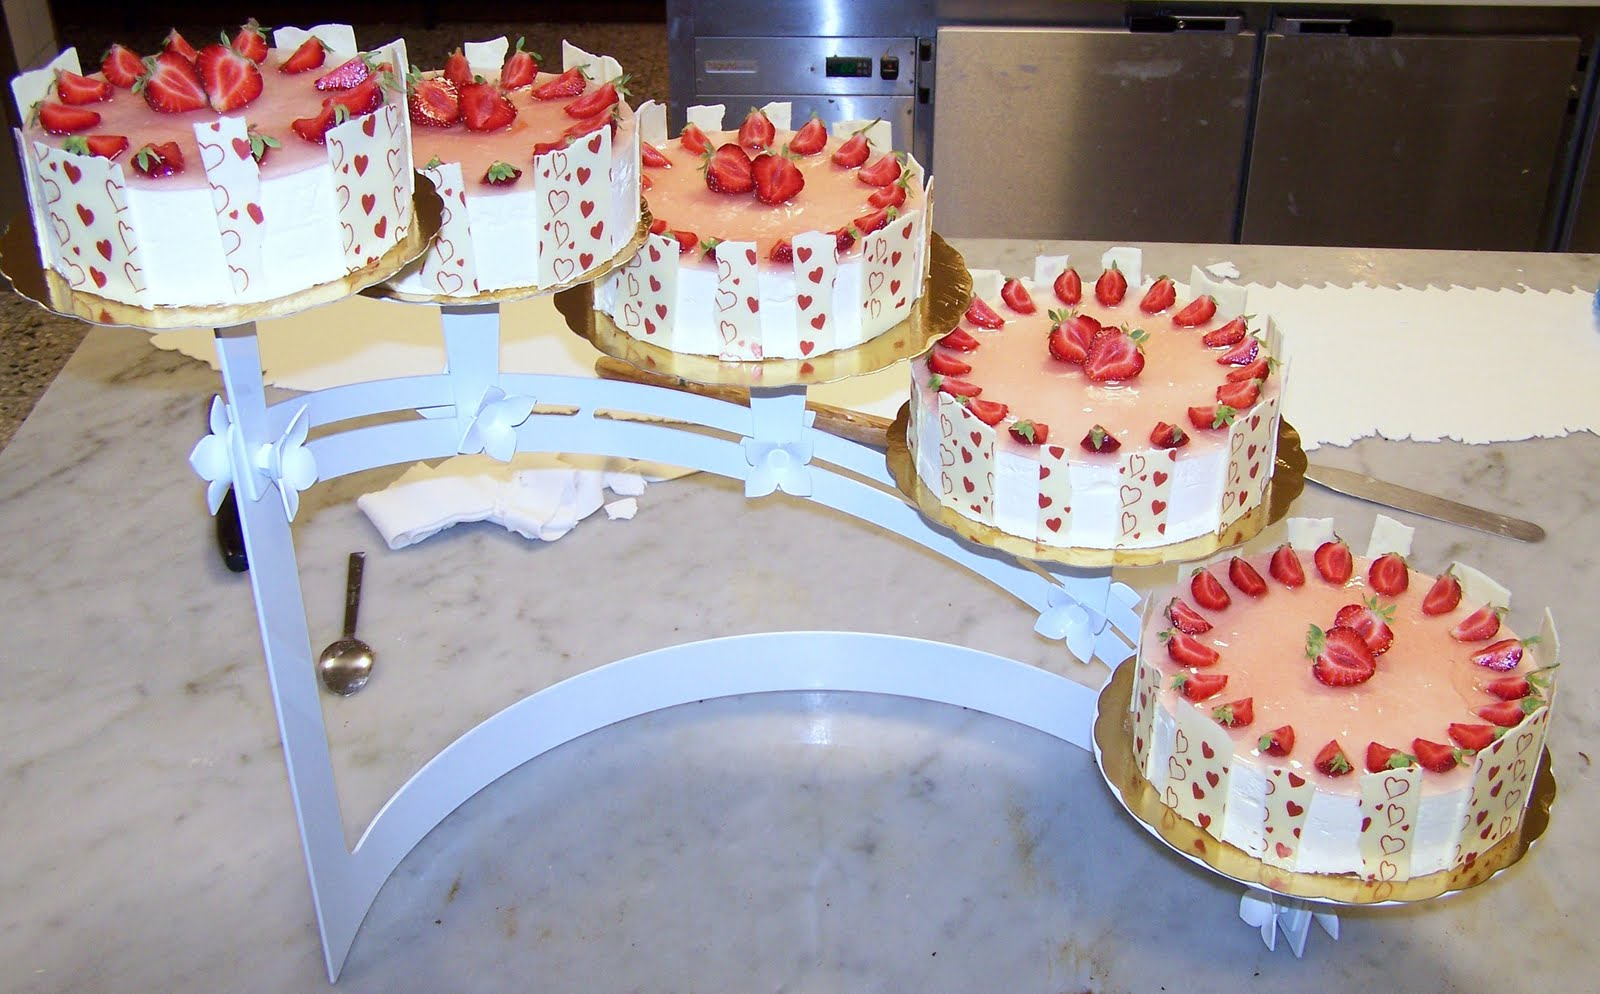 dekoration på bröllopstårta